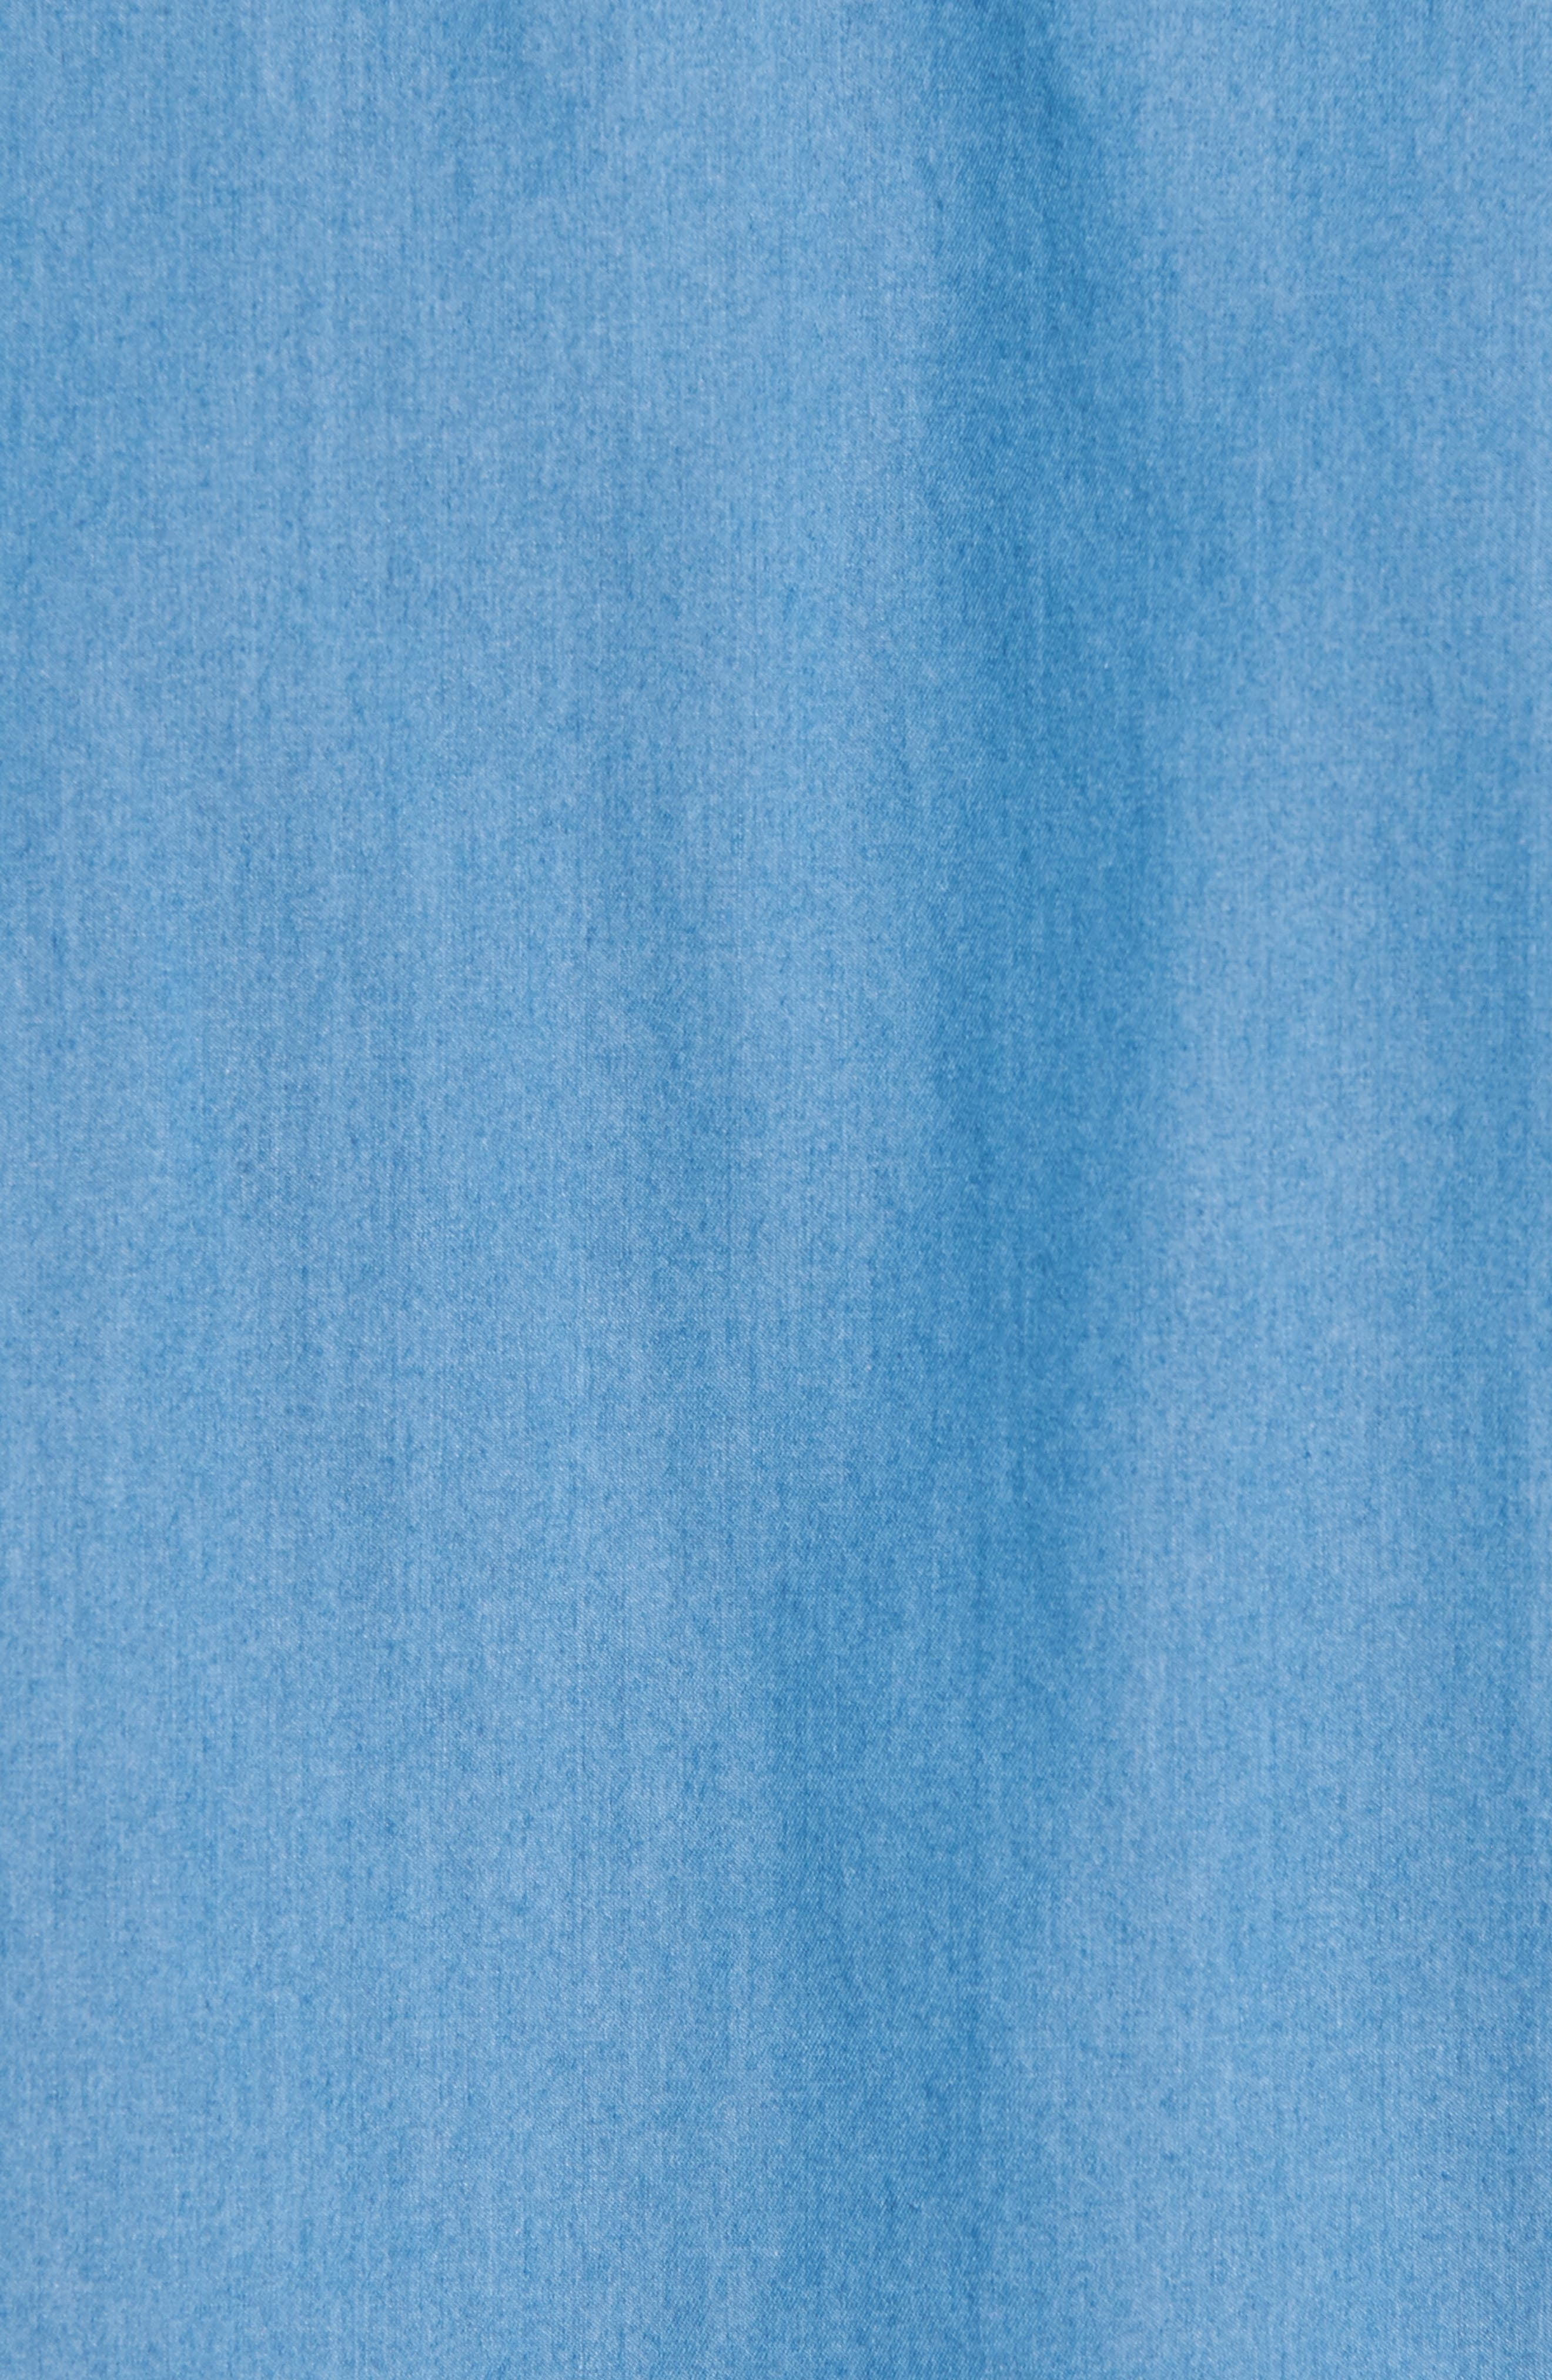 Robb Trim Fit Denim Short Sleeve Sport Shirt,                             Alternate thumbnail 5, color,                             Blue